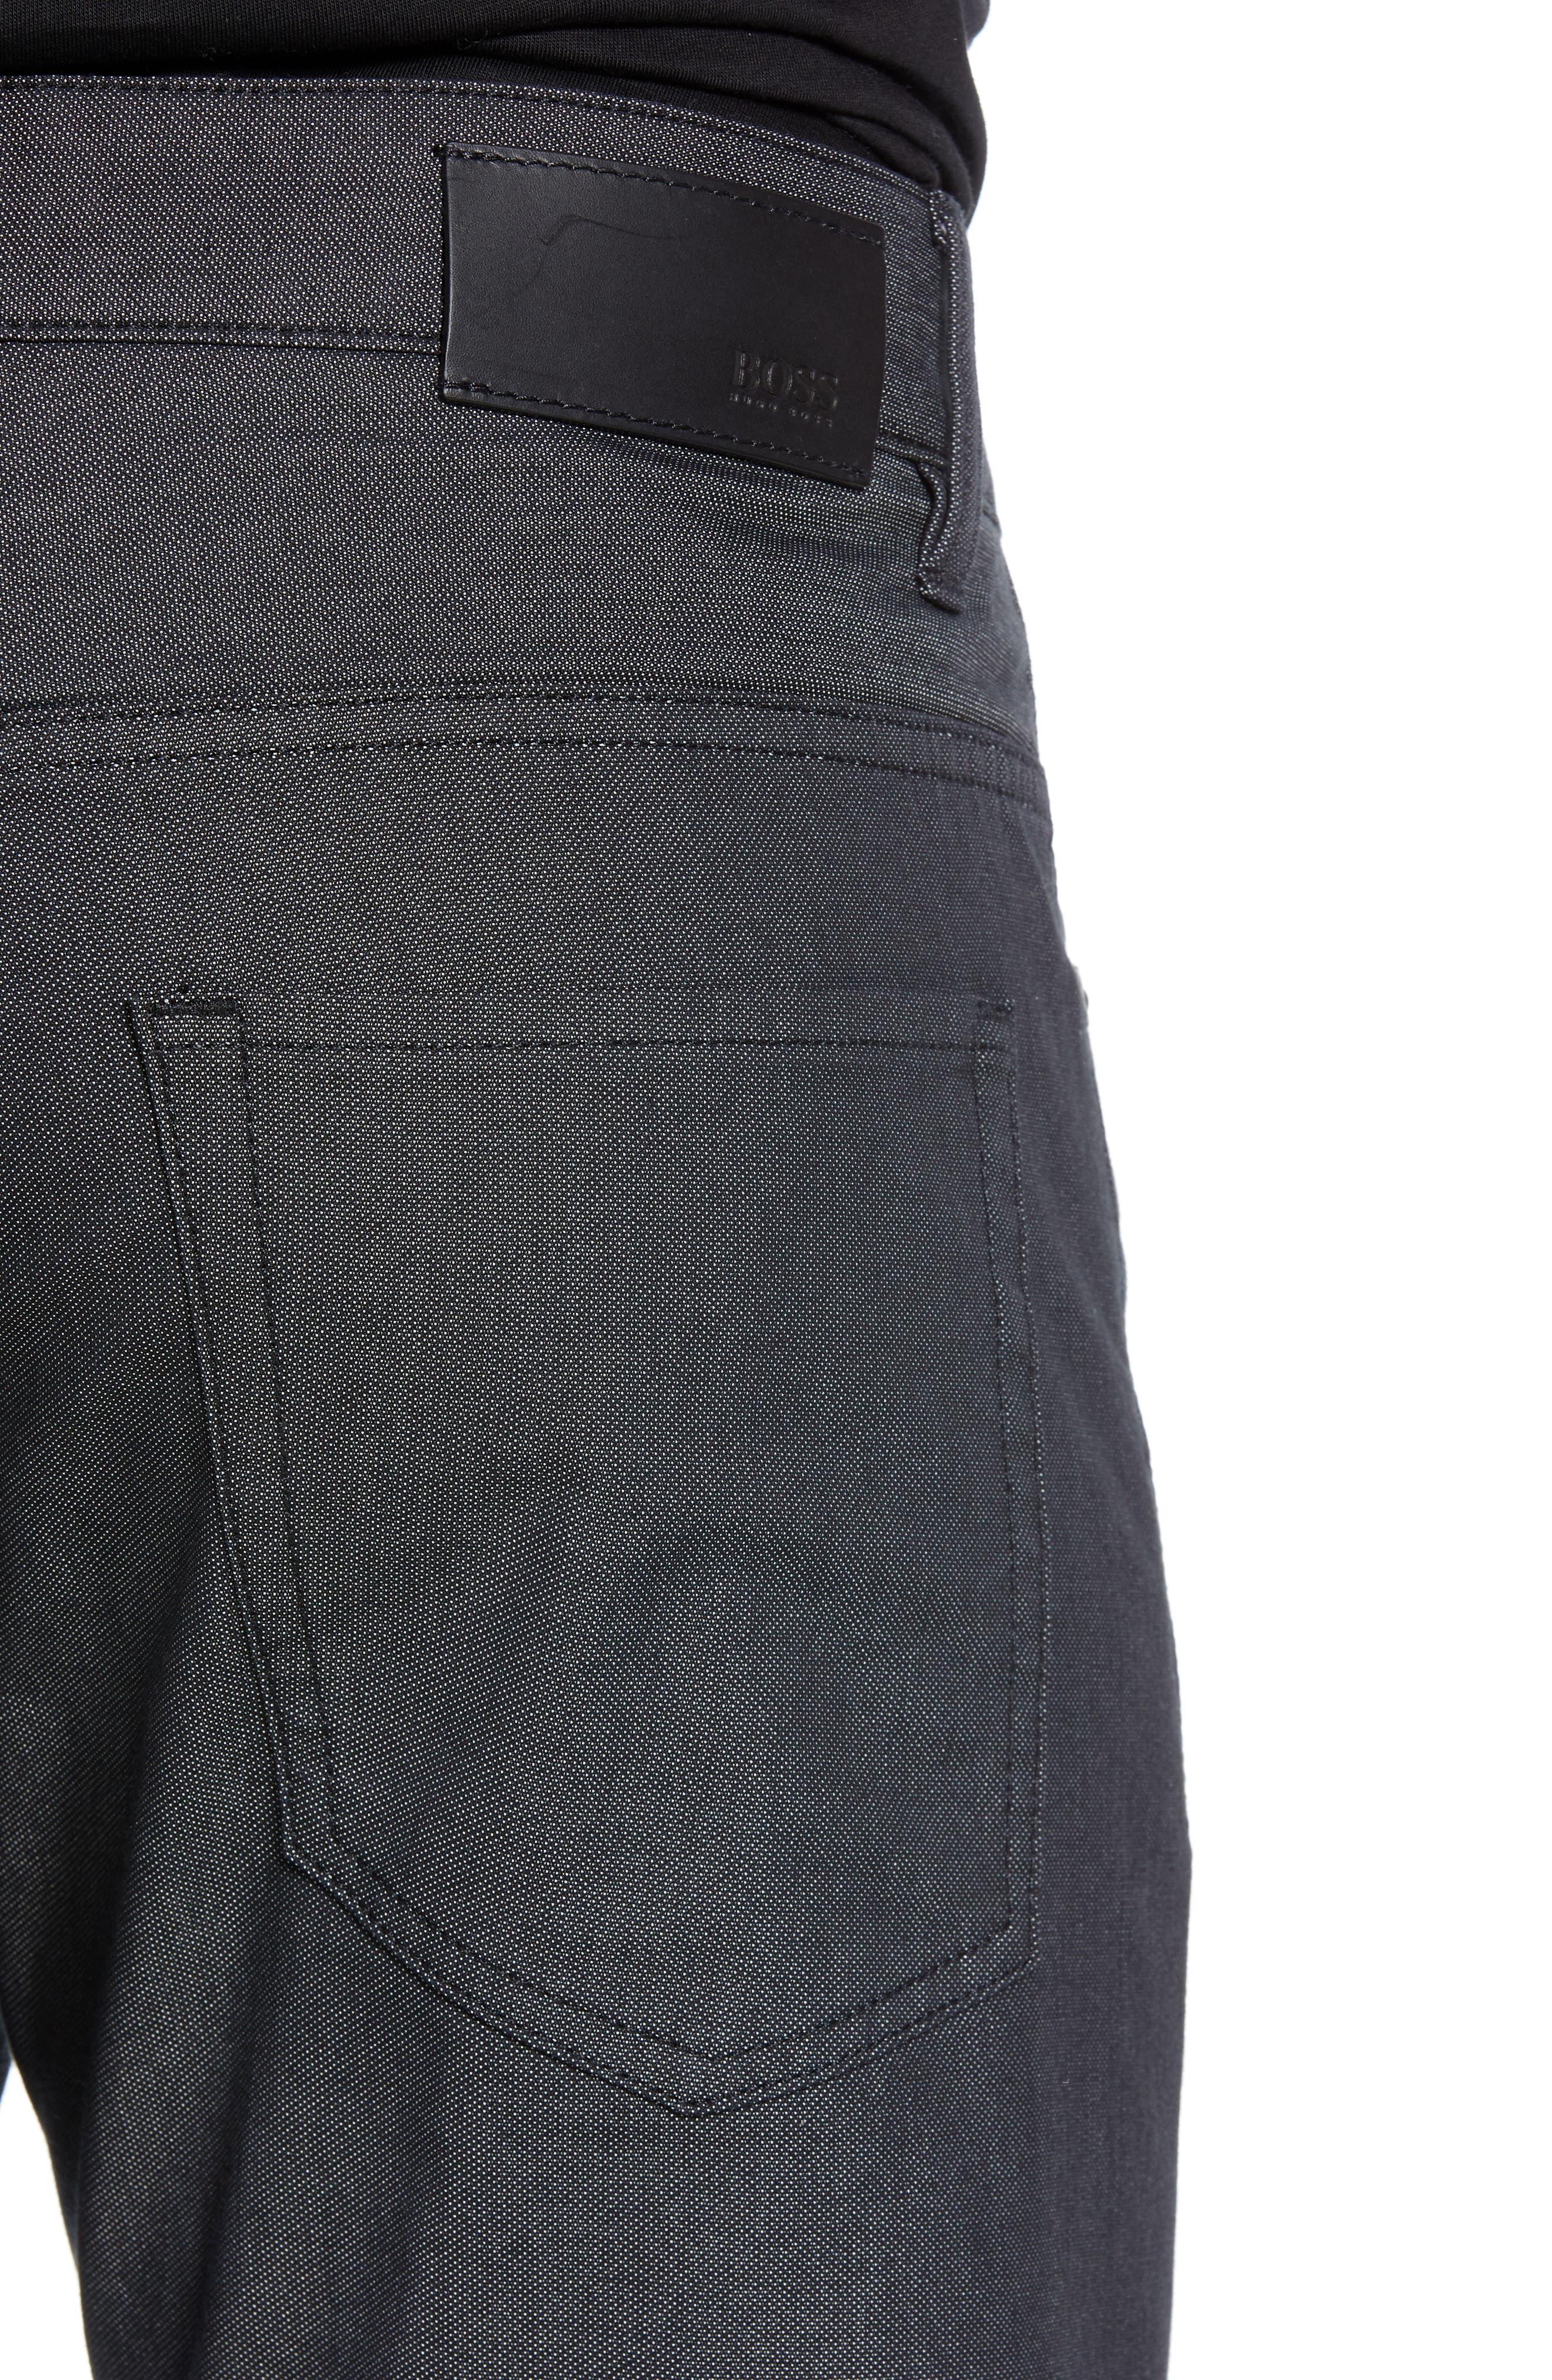 Delaware Slim Fit Pin Dot Pants,                             Alternate thumbnail 4, color,                             BLACK